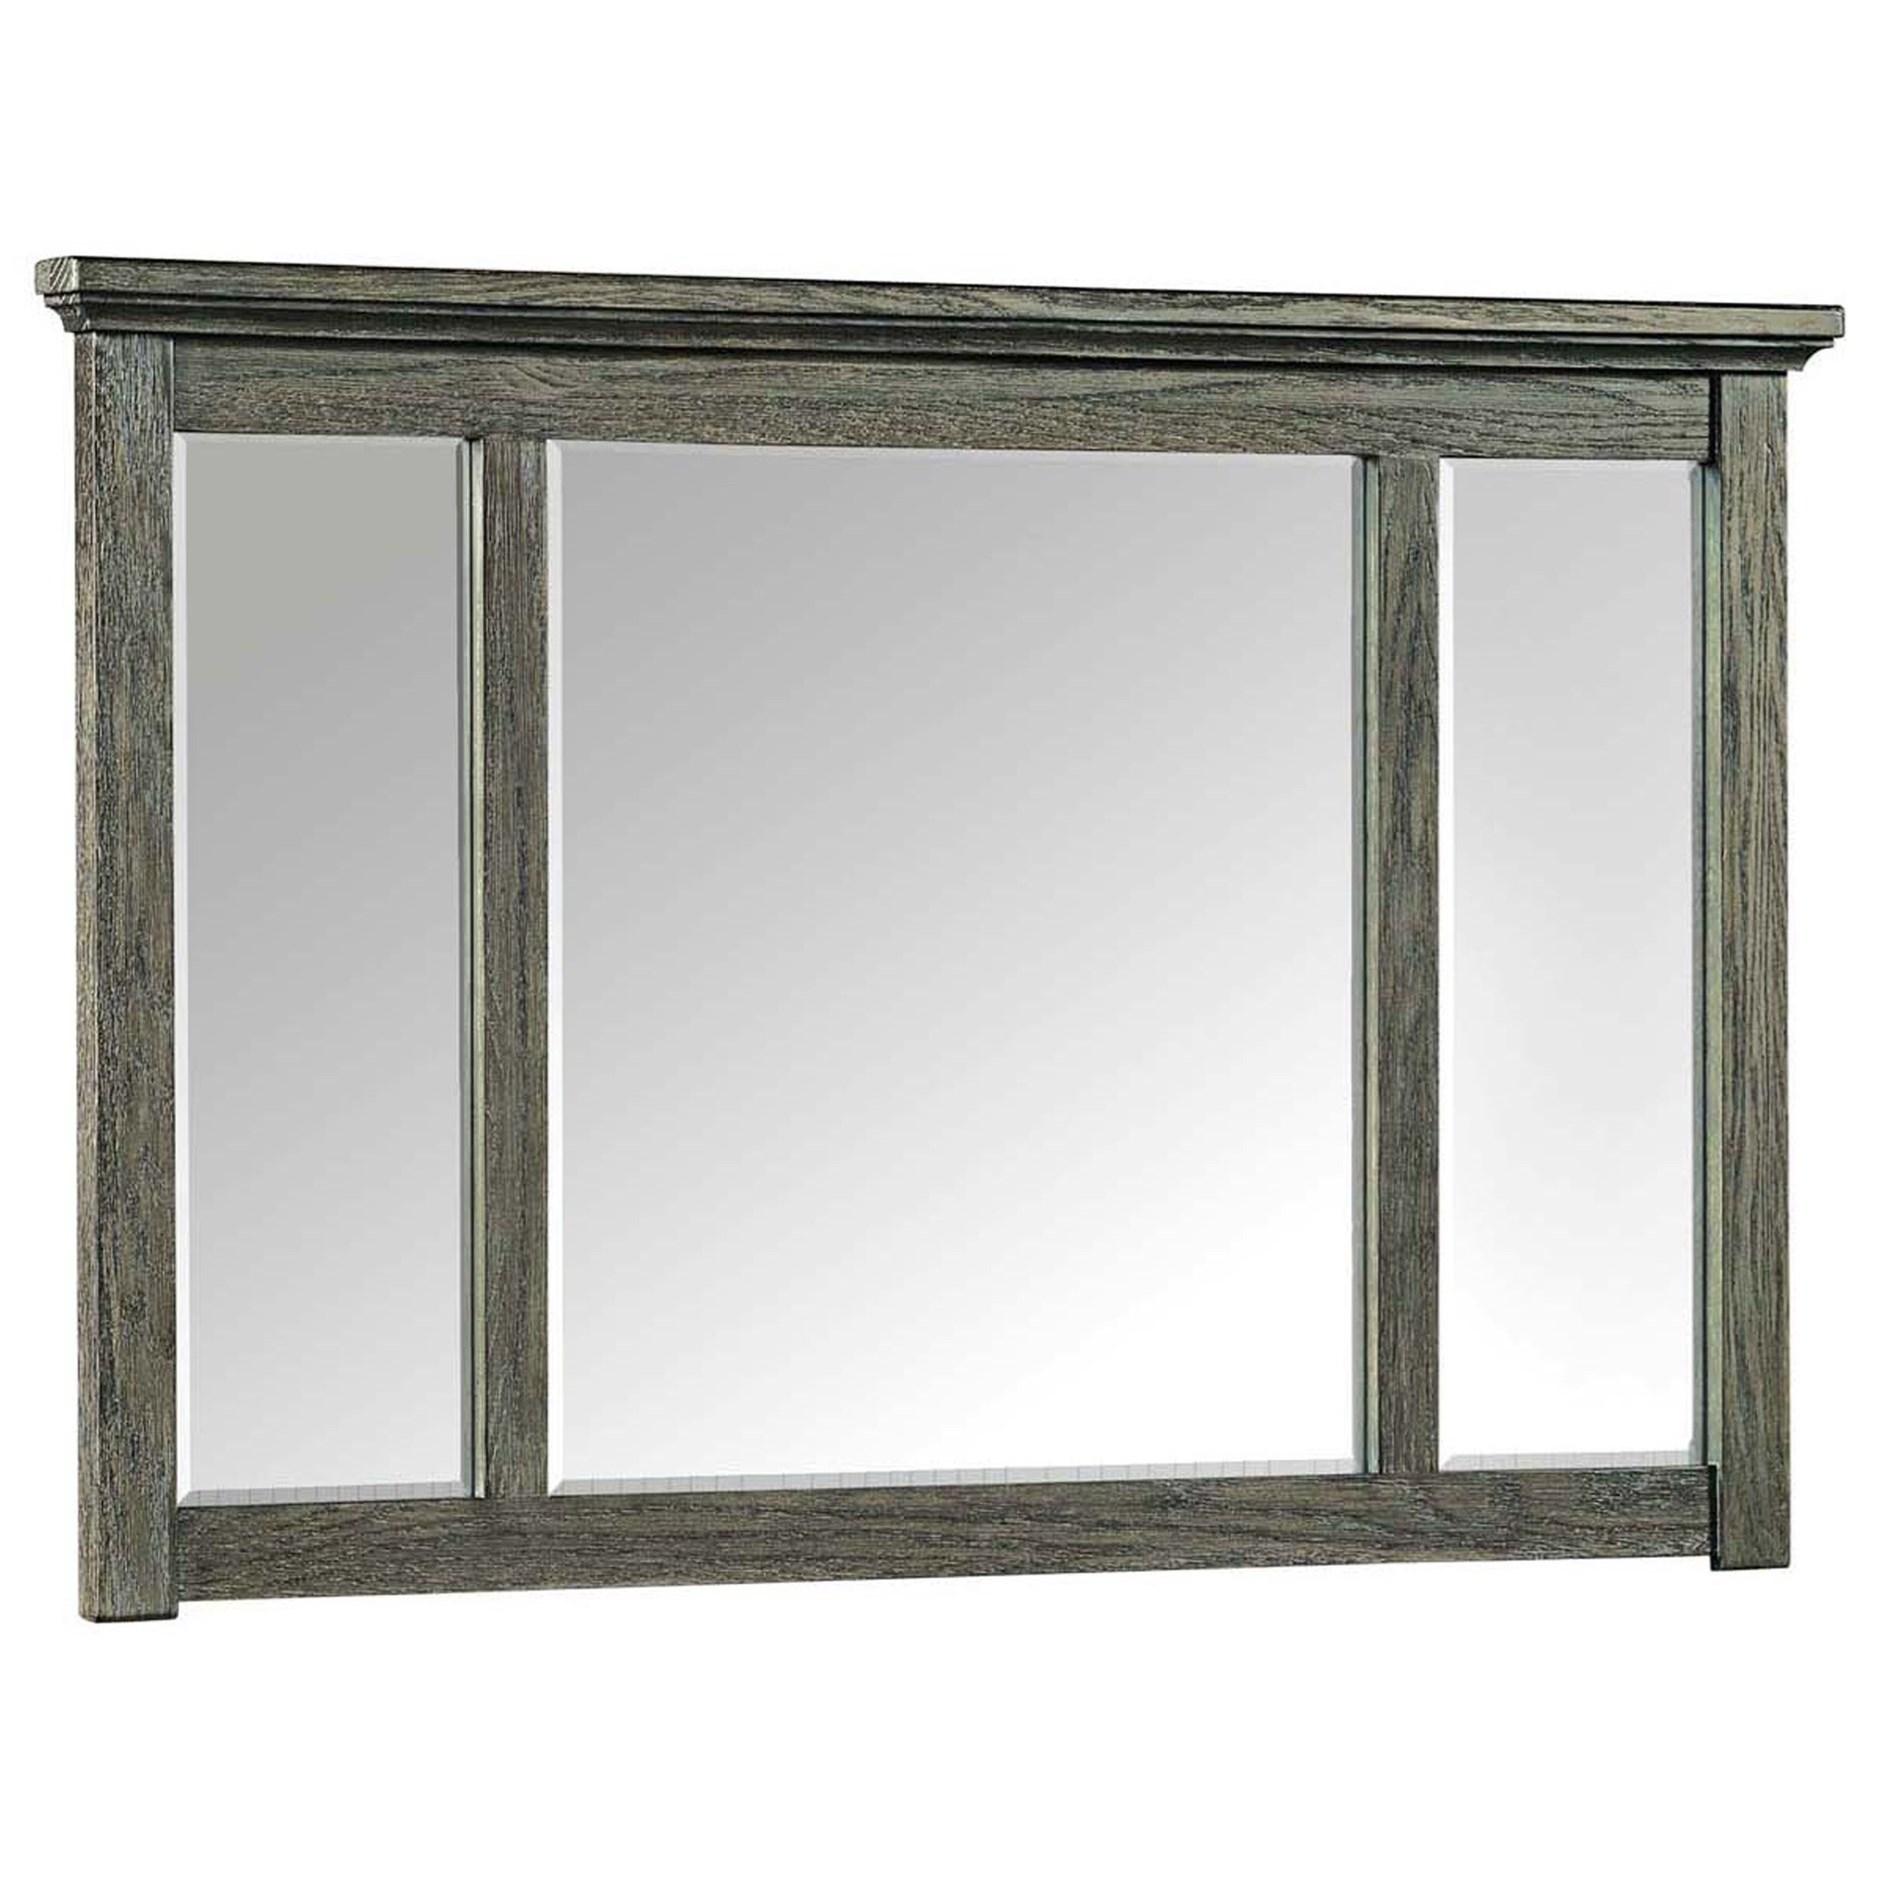 Oak Park Pewter Dresser Mirror by Intercon at Dinette Depot